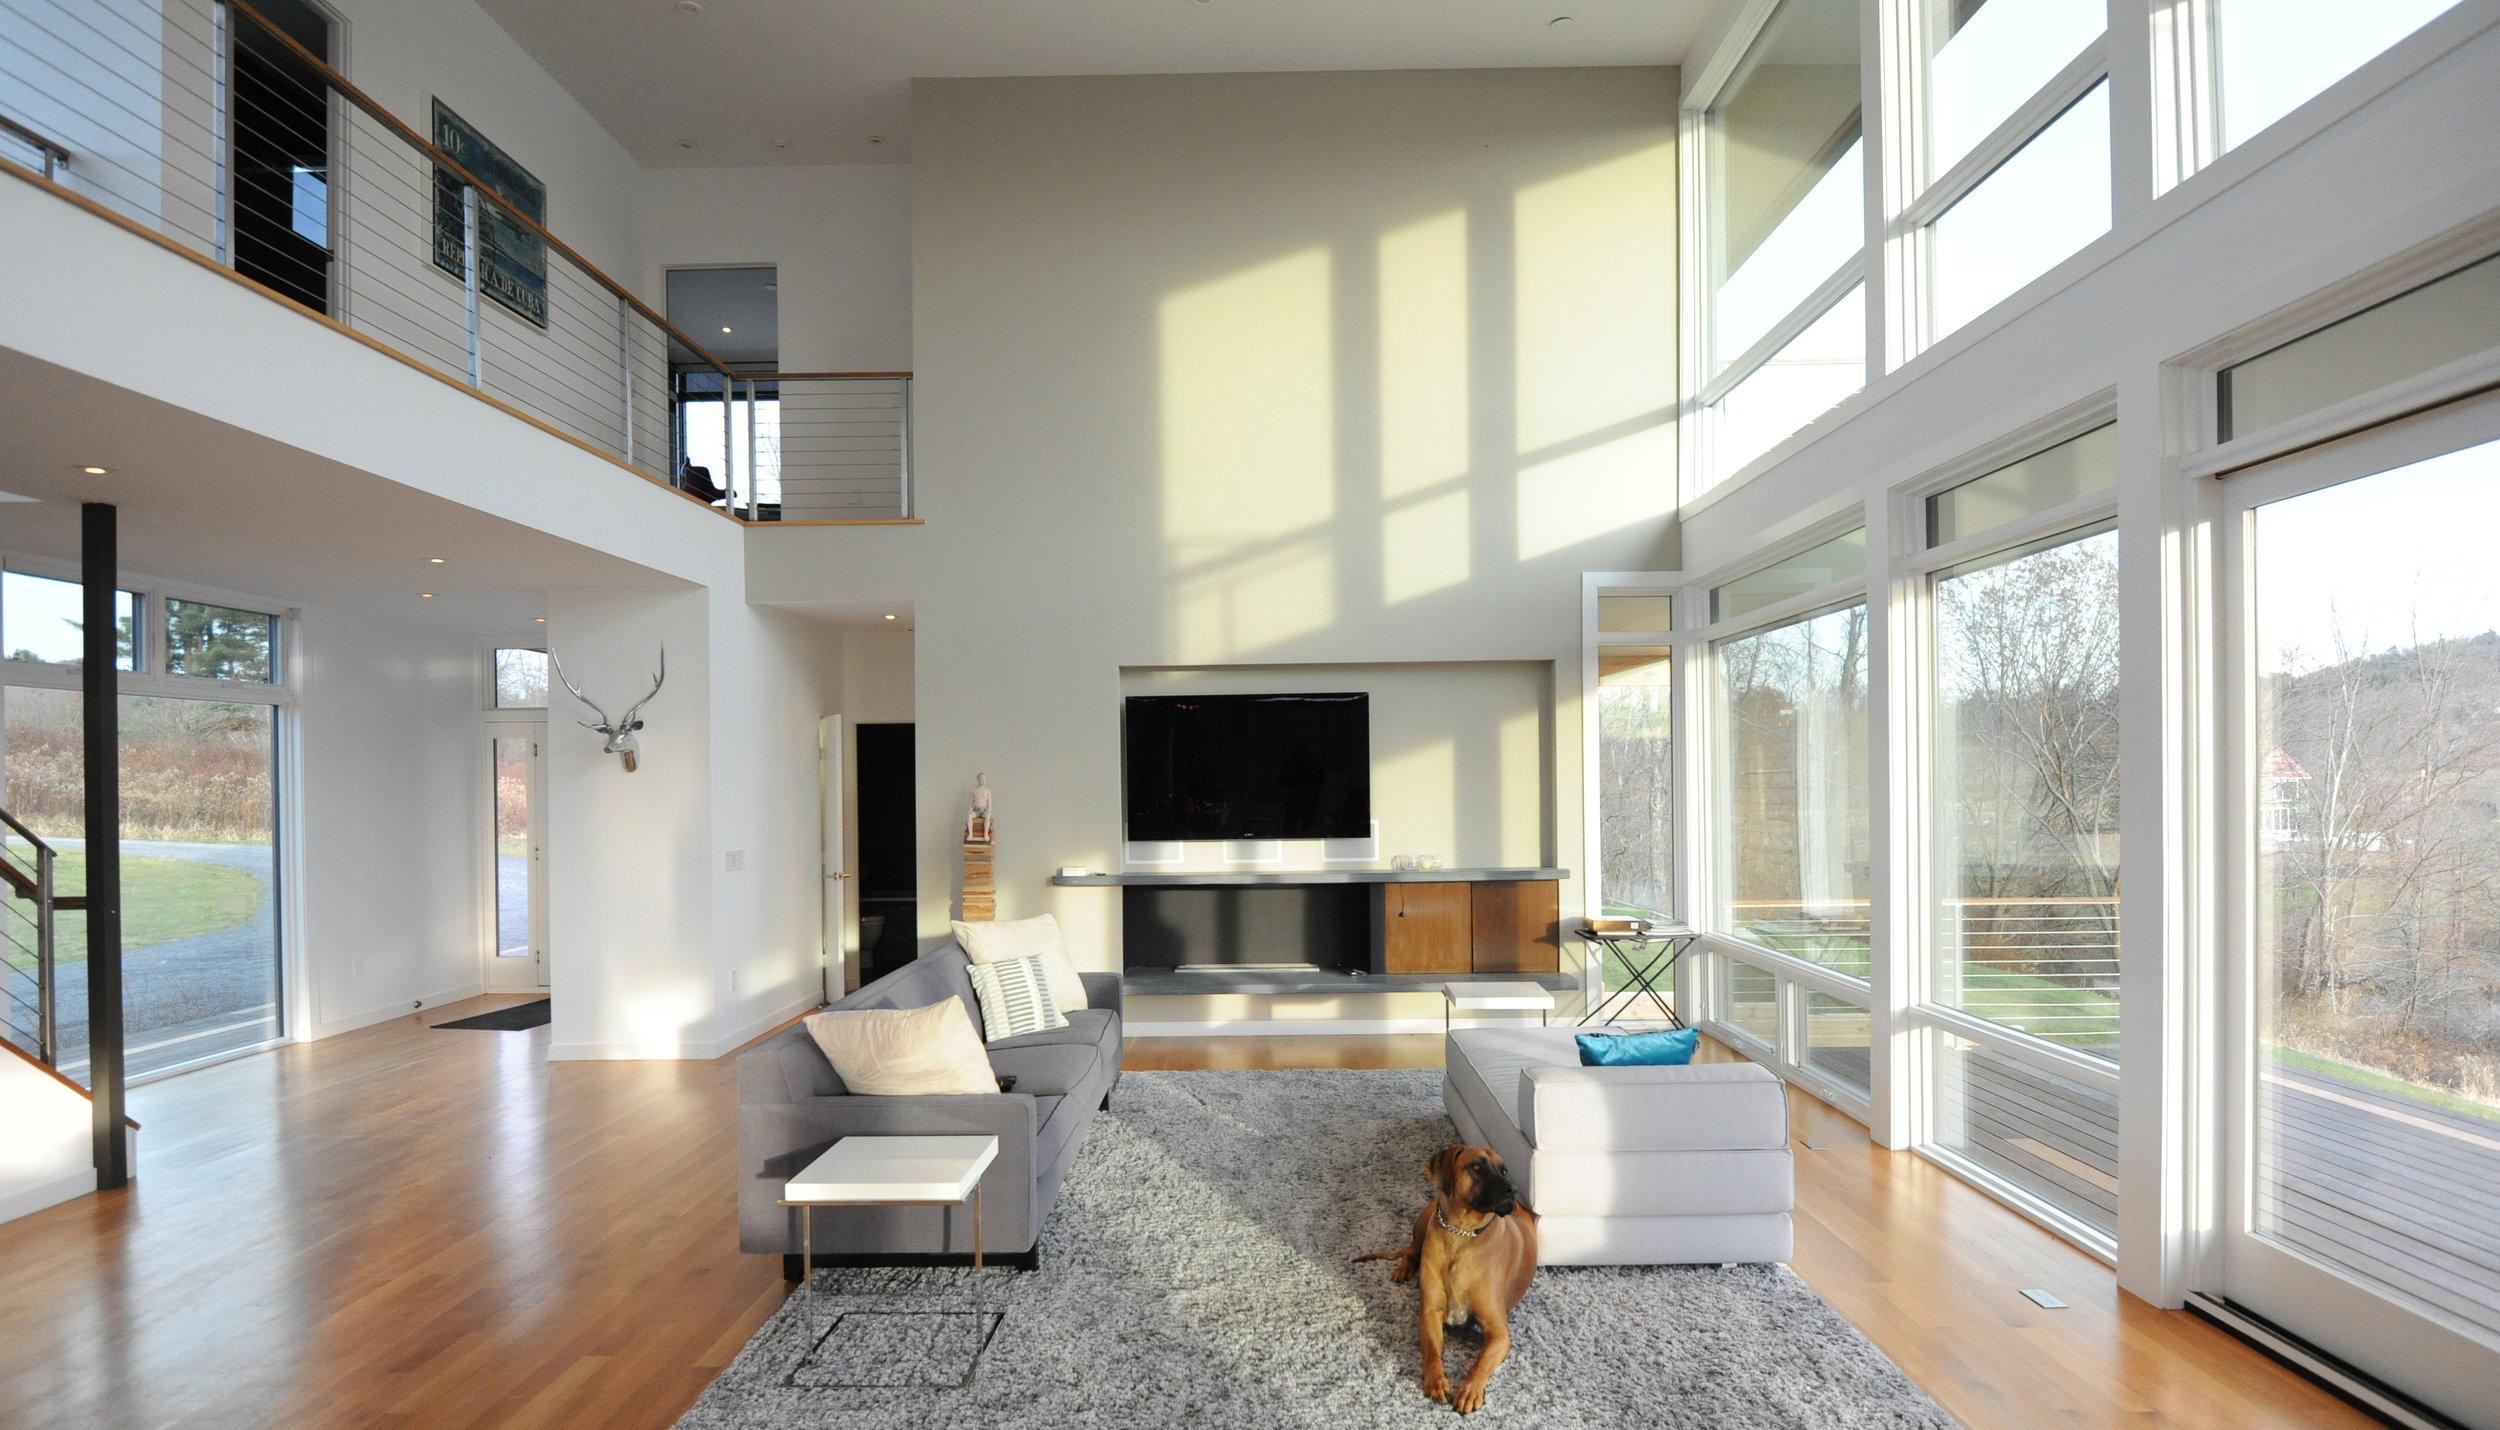 turkel_modern_design_prefab_home_writers_retreat_interior_great_room.jpg